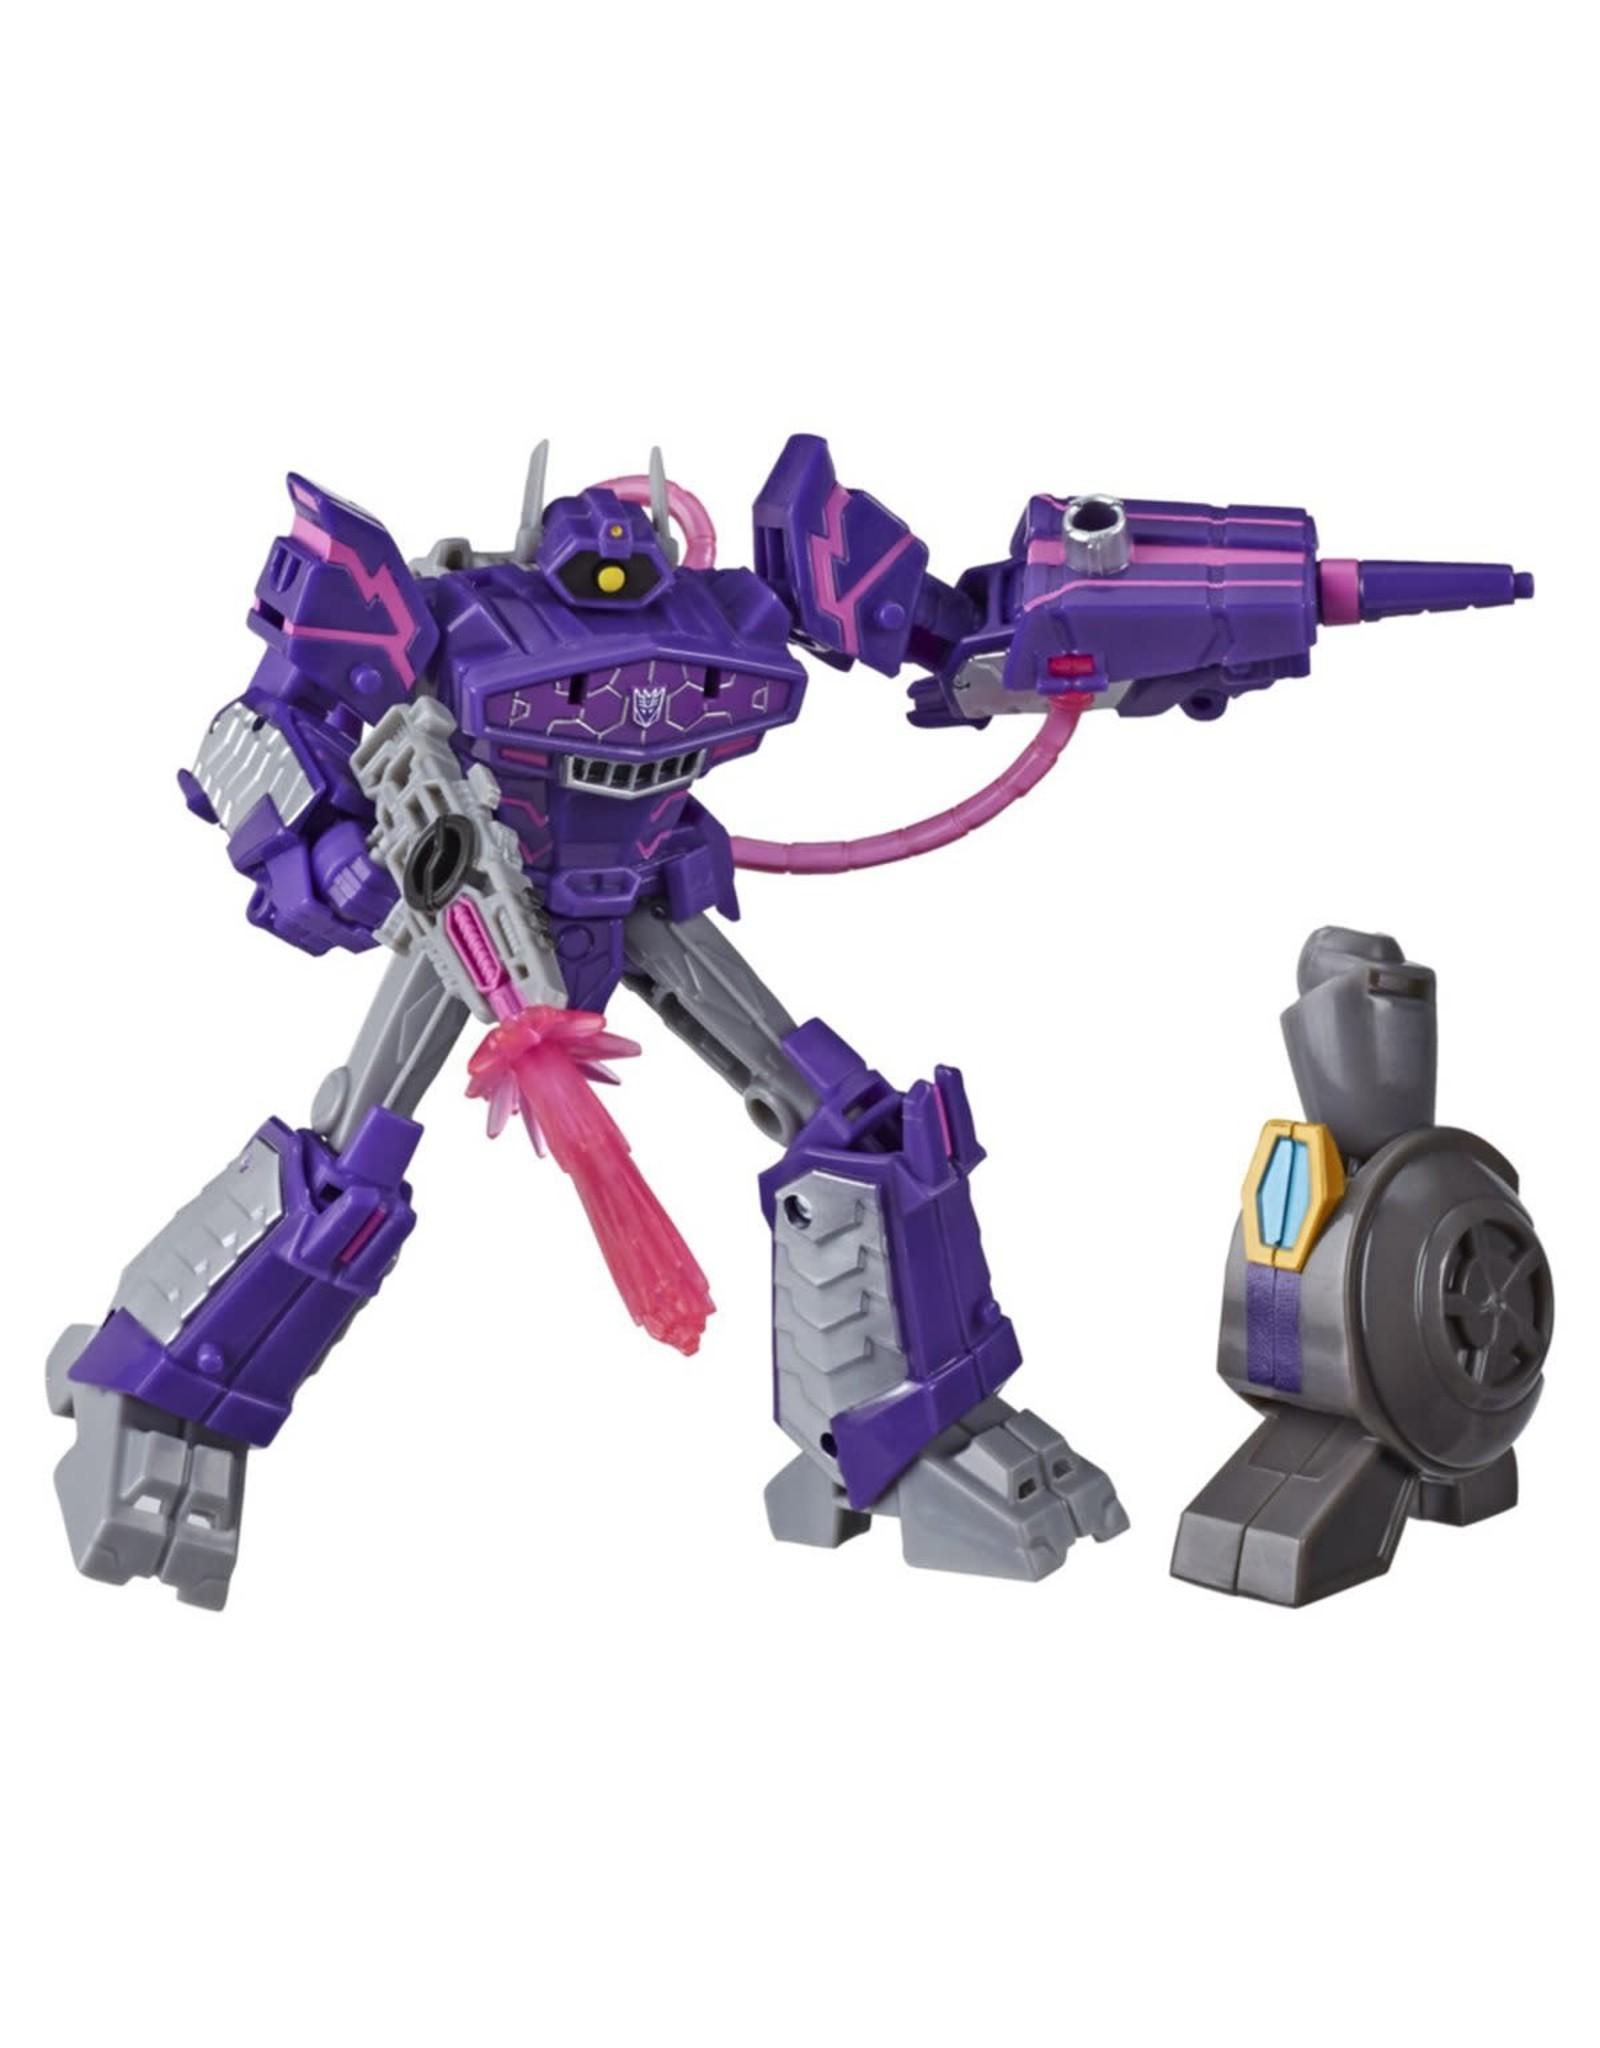 Hasbro Transformers Cyberverse Deluxe Shockwave